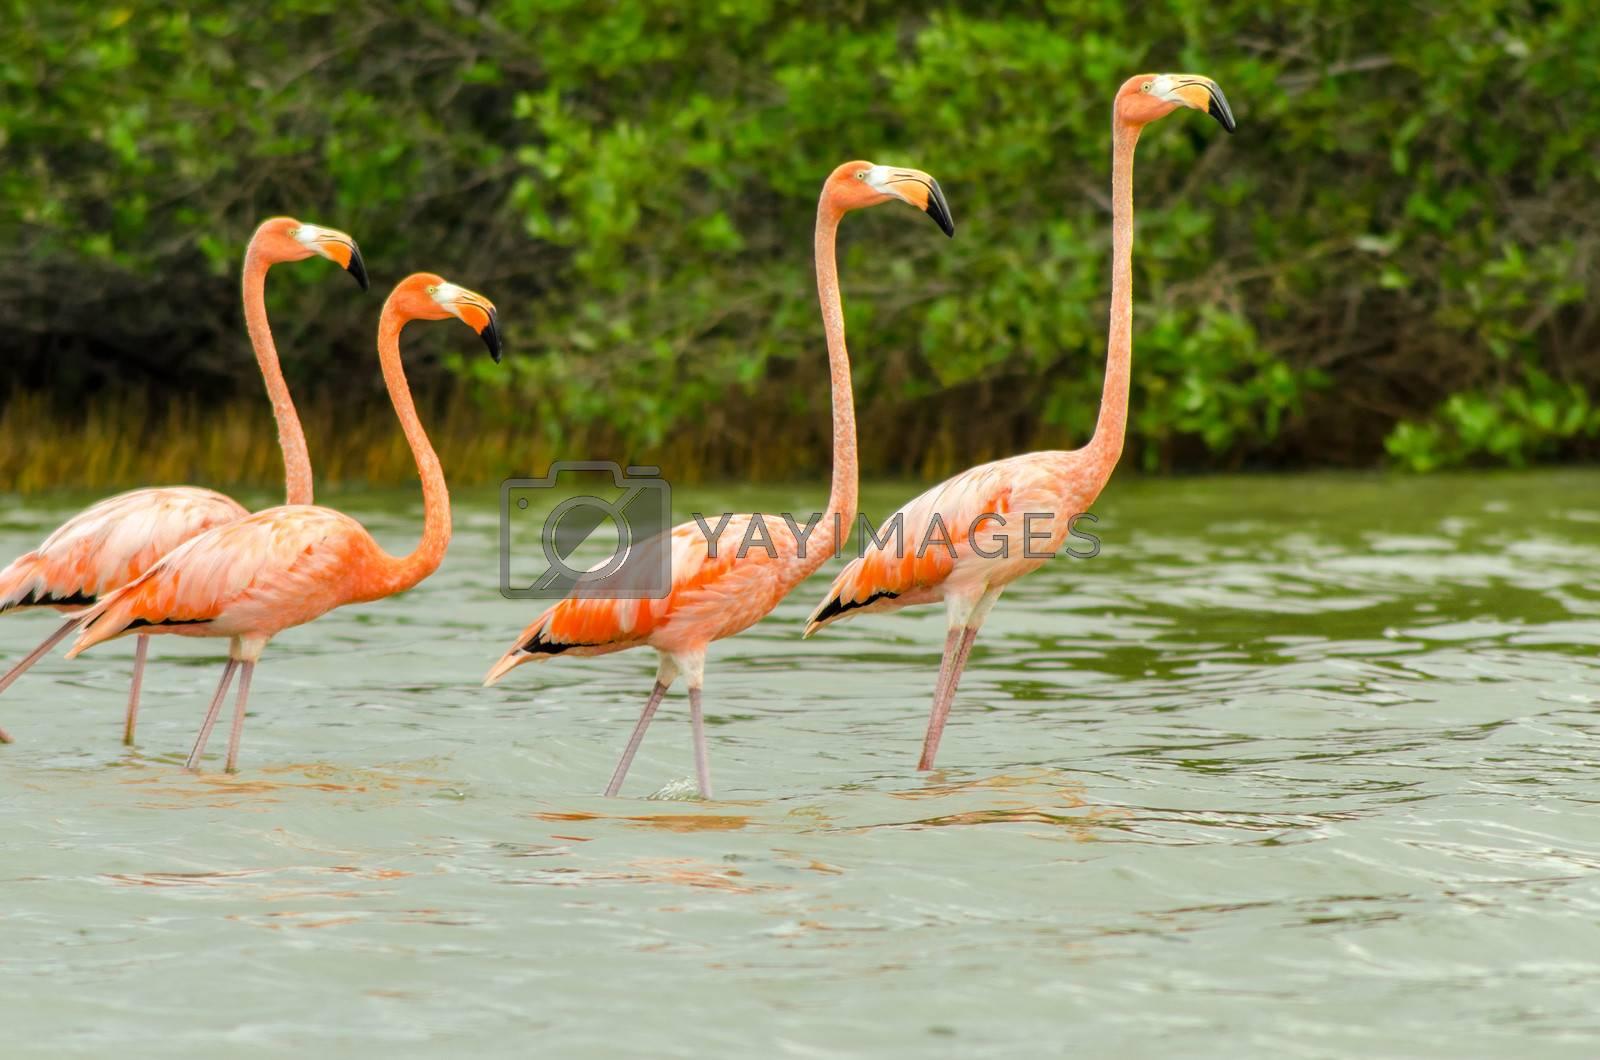 Four flamingos walking in shallow water in Camarones in La Guajira, Colombia